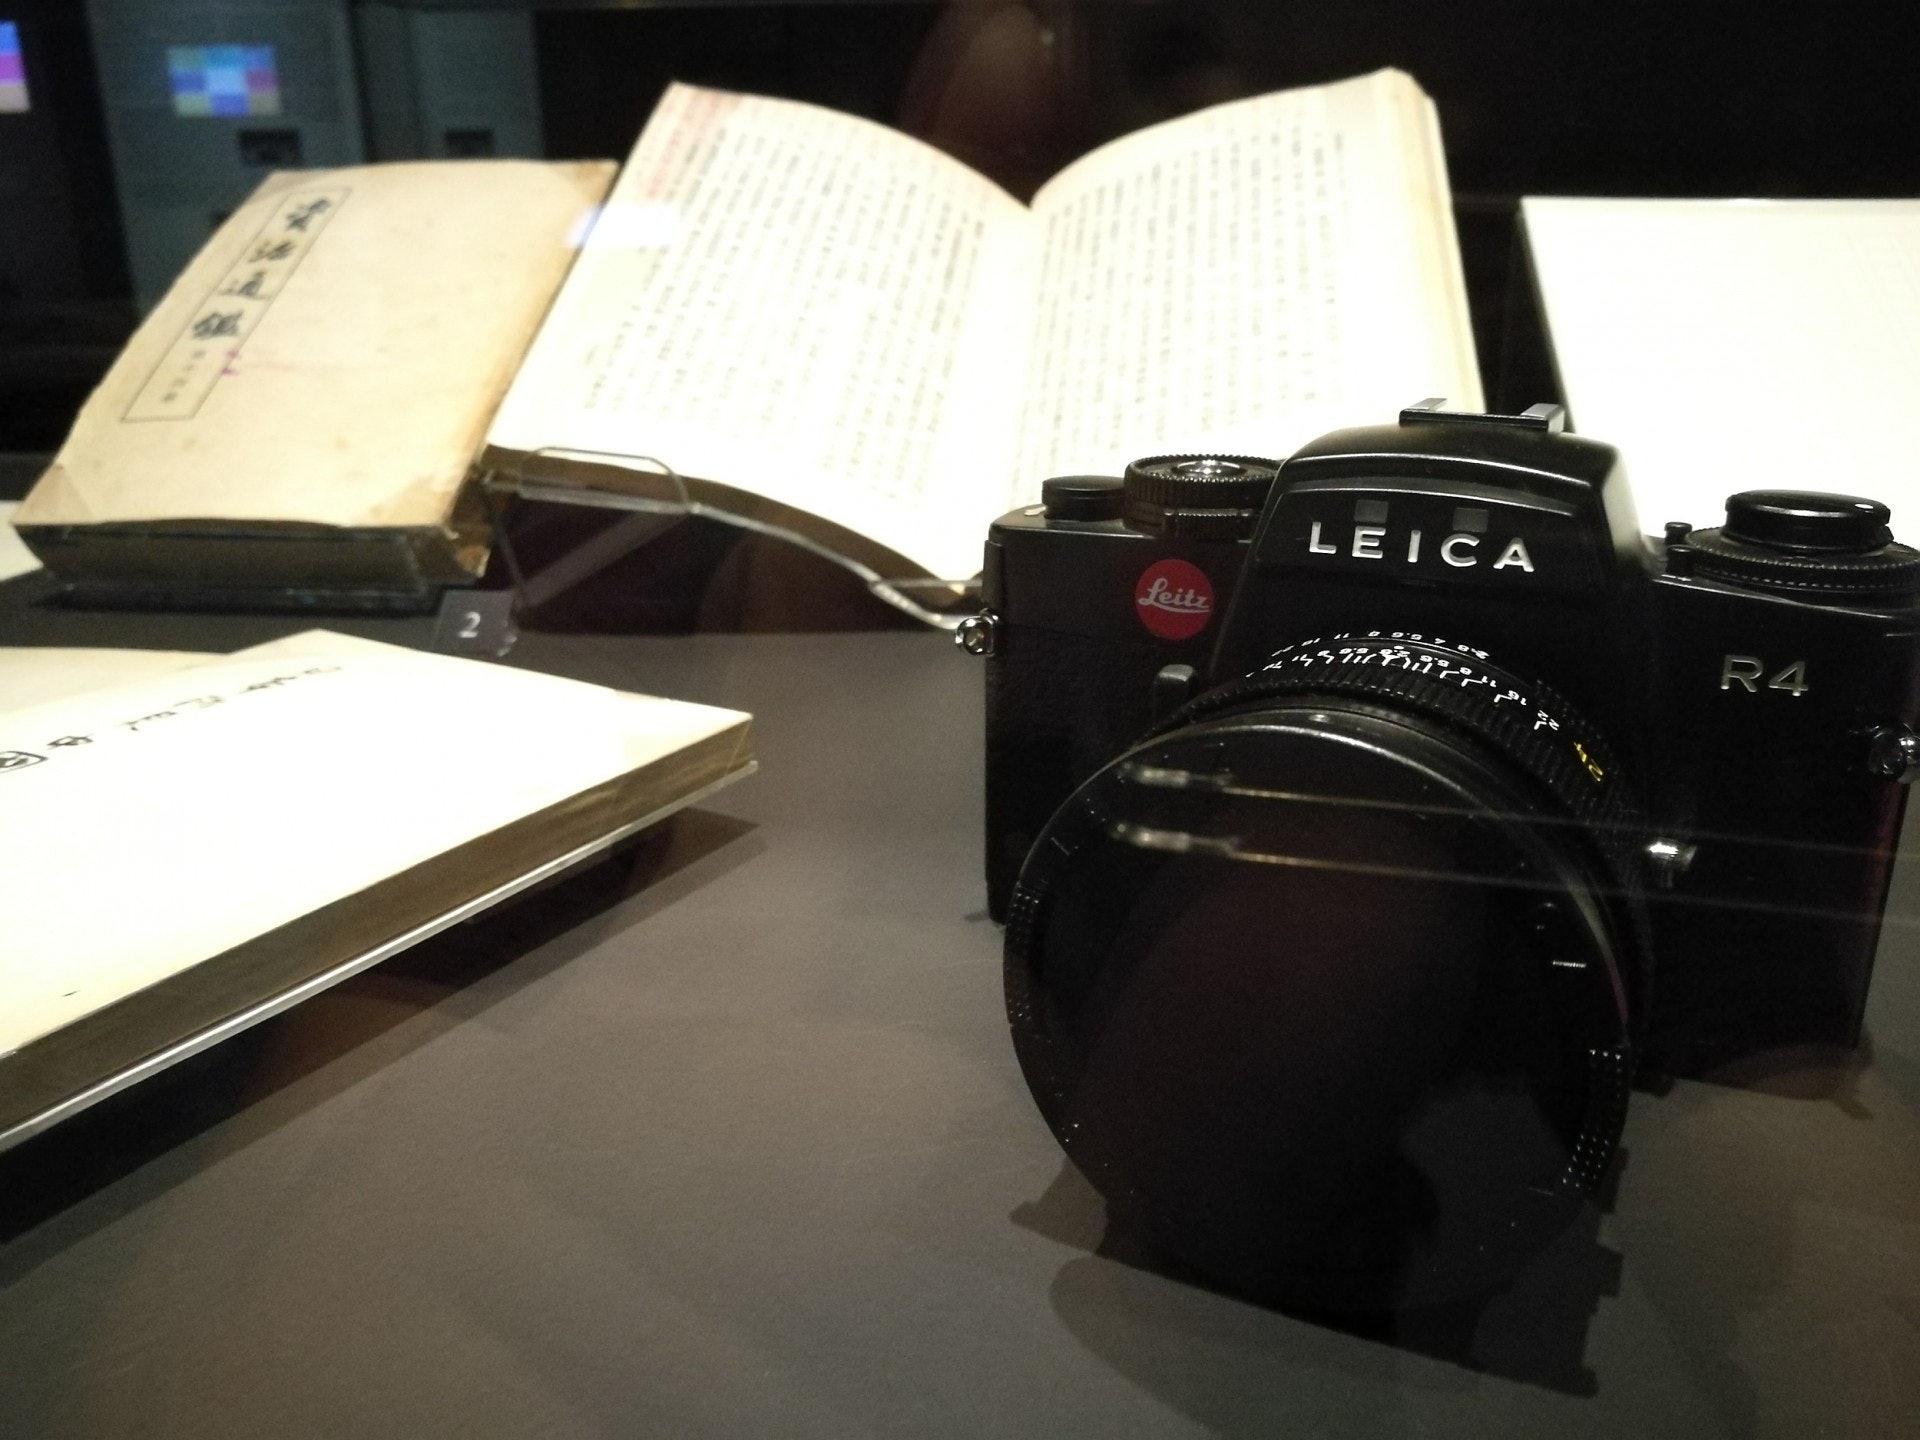 Leica R4是80年代產物,相信是查先生的心頭好。(VCG)